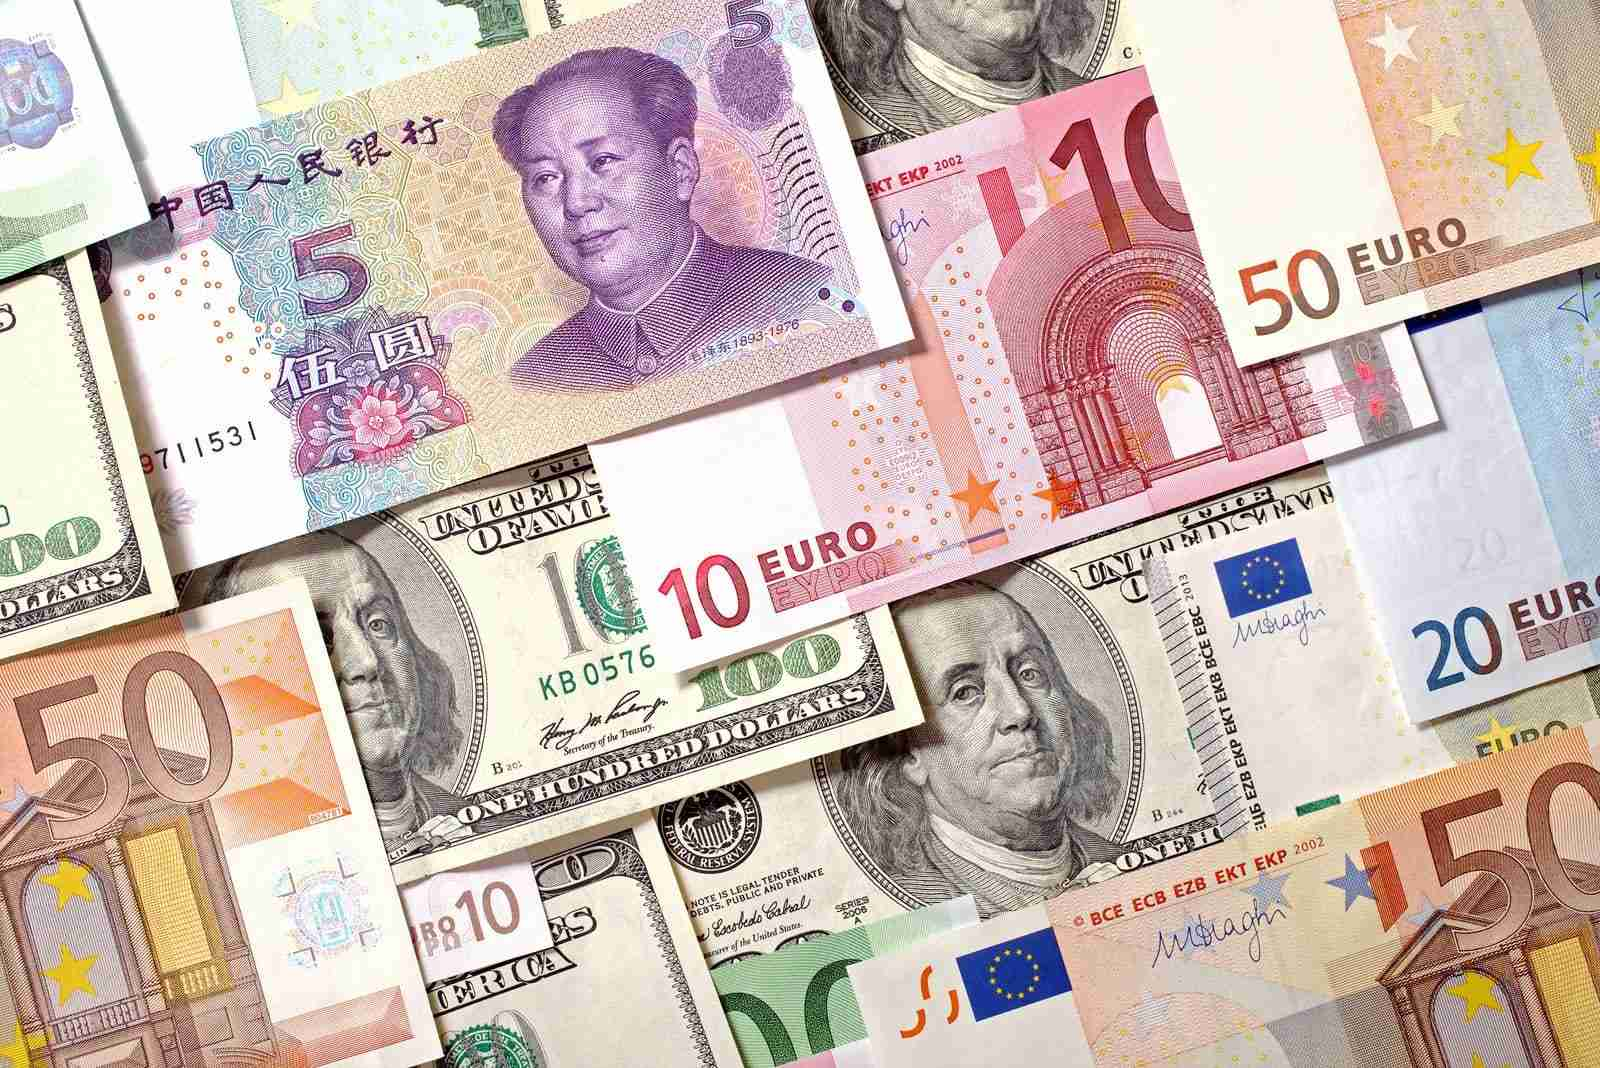 Chinese Symbols Mark Fake Us Money Found In Mason City Kcha News